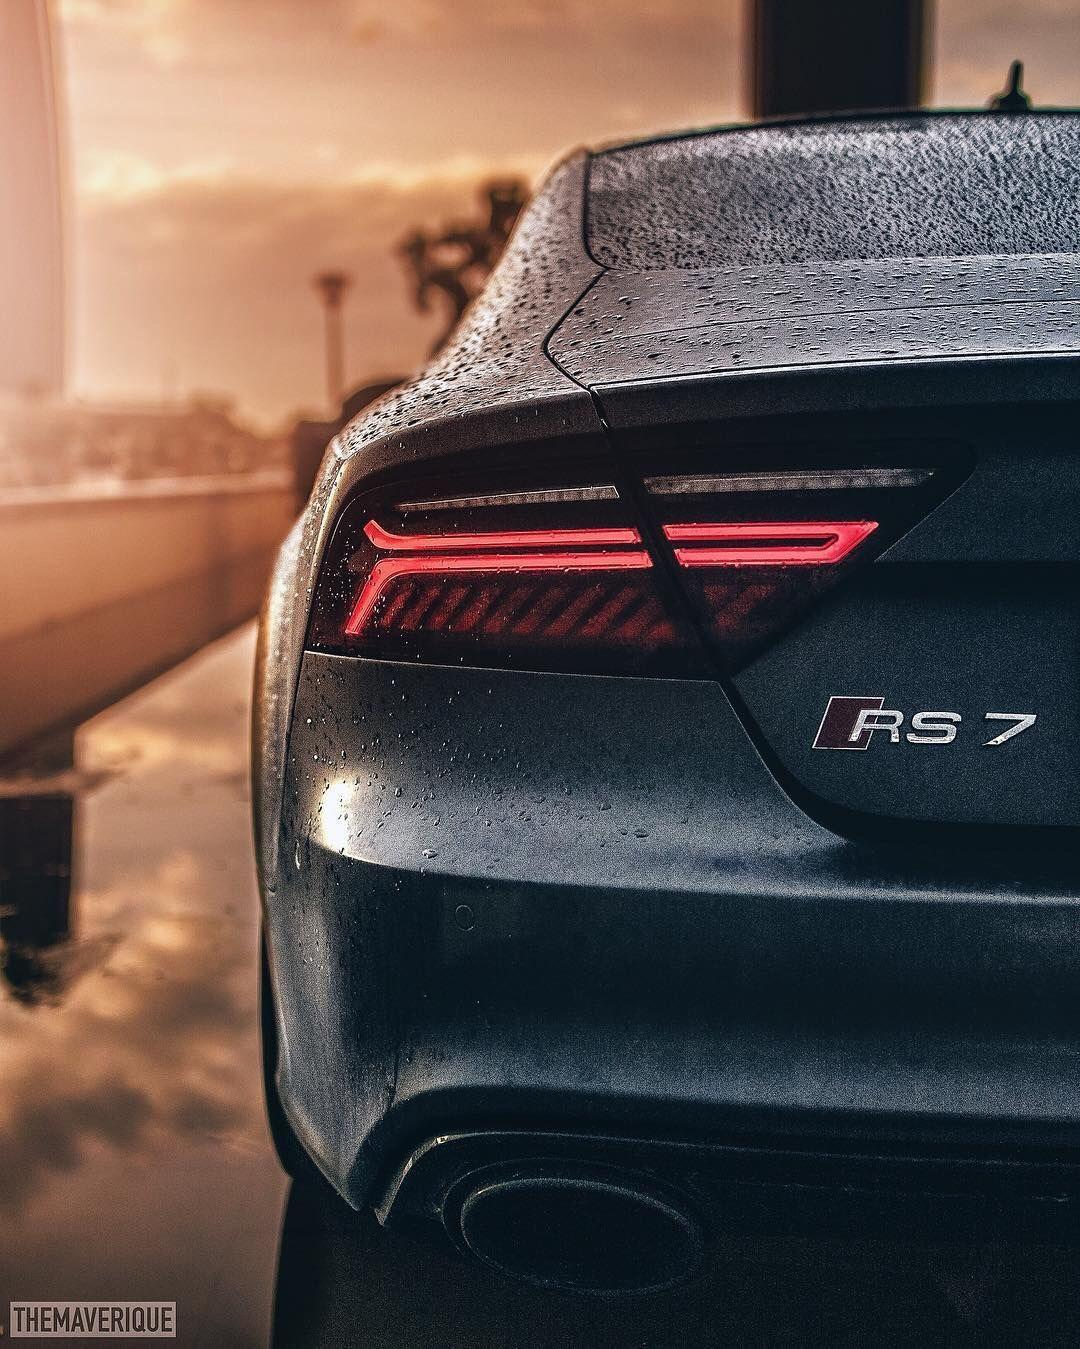 Audi Rs7 Iphone Wallpapers Wallpaper Cave